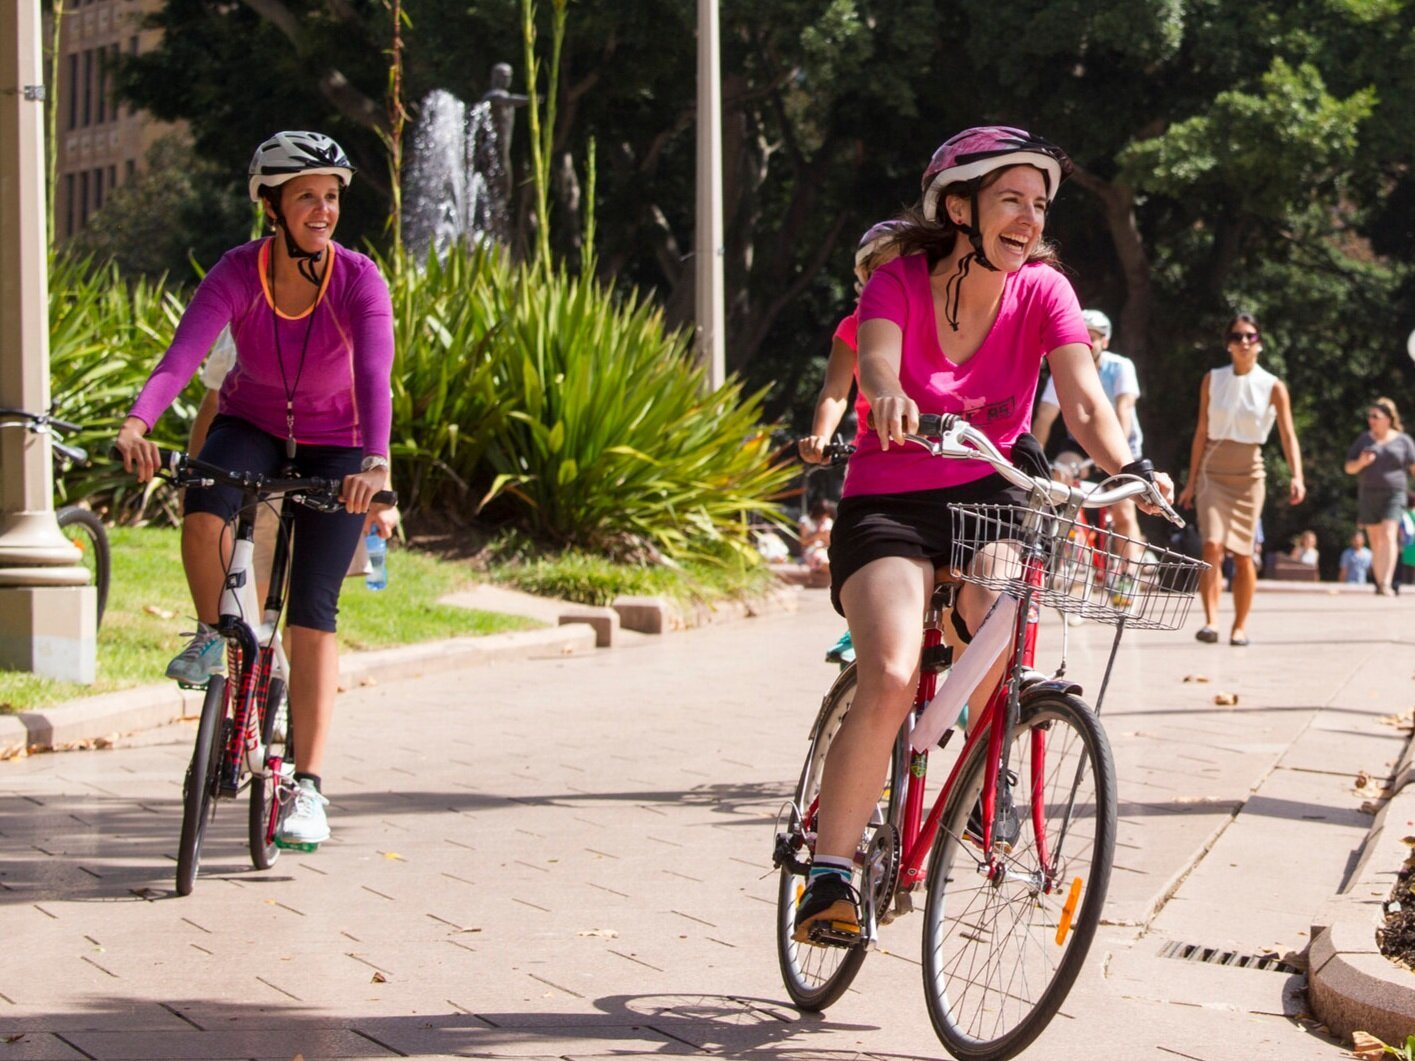 Two women riding